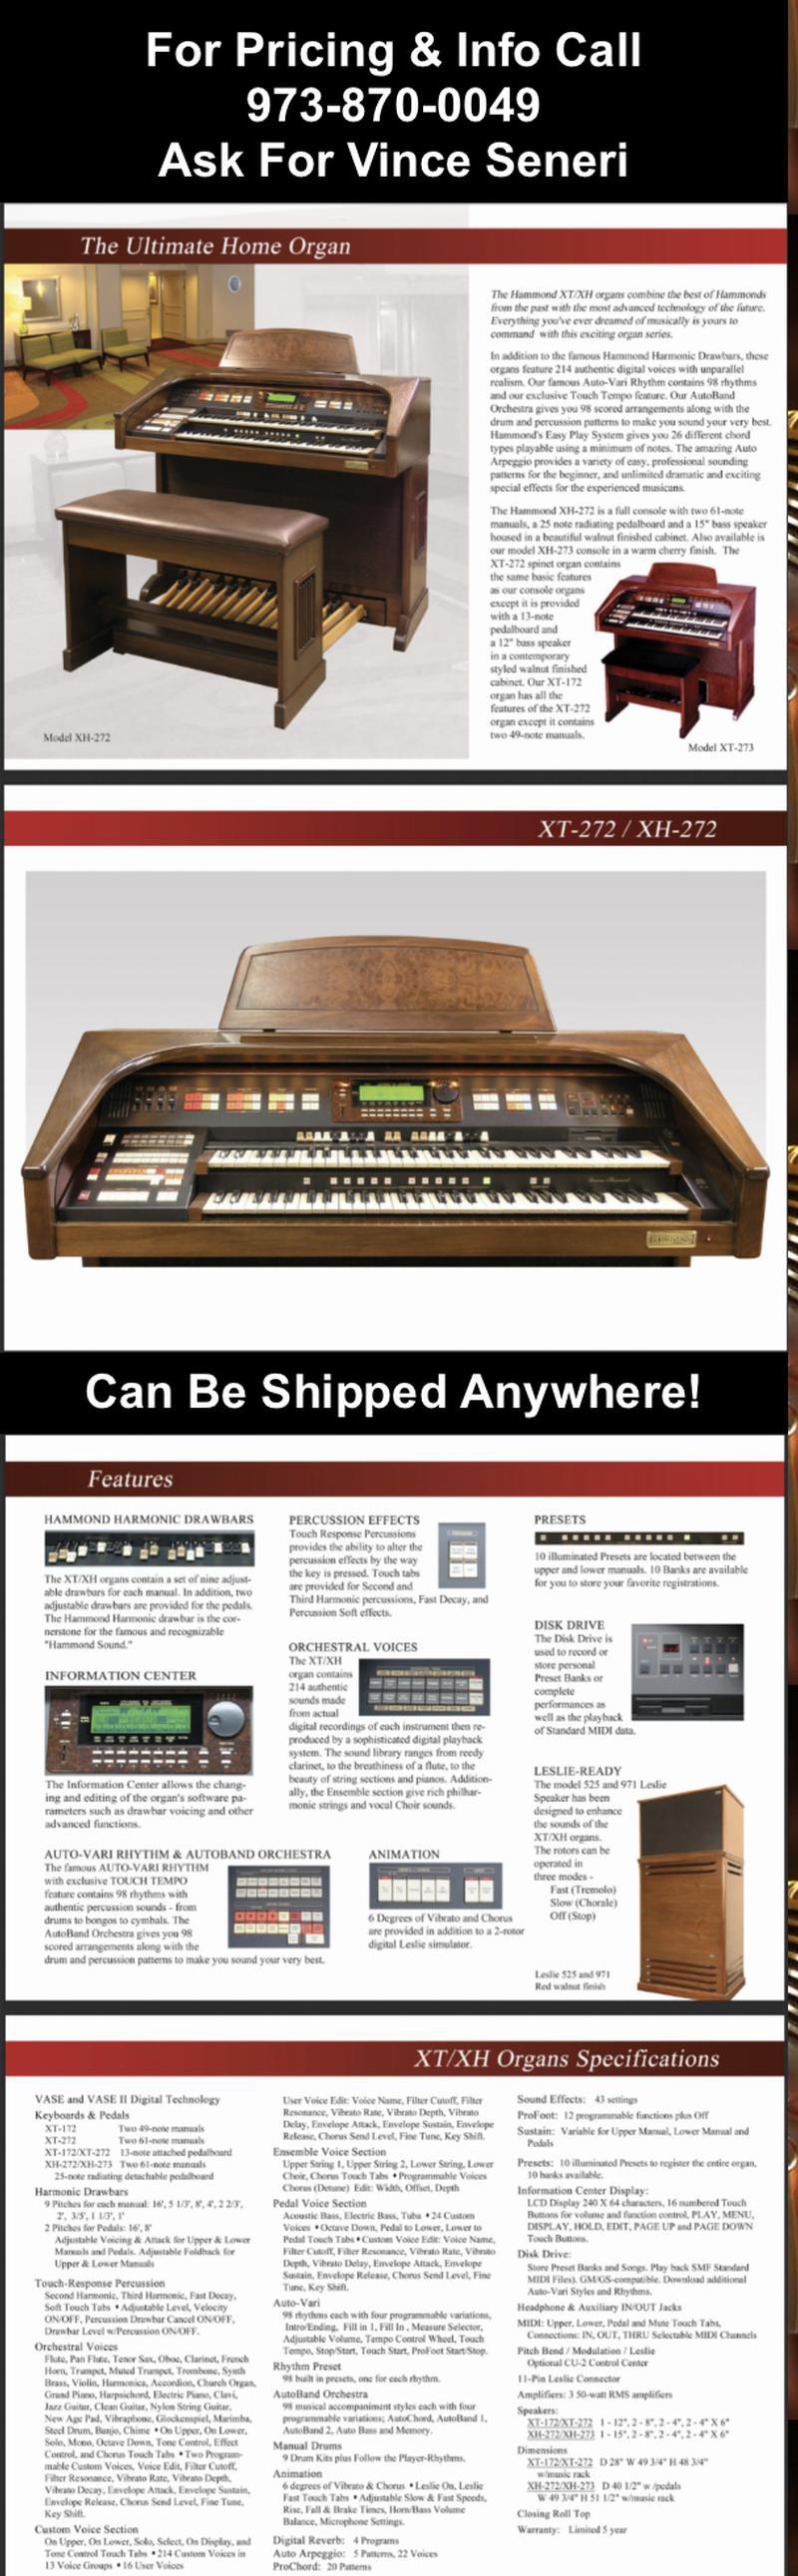 Hammond XH 272 Organ-Available! - Hammond Organ World